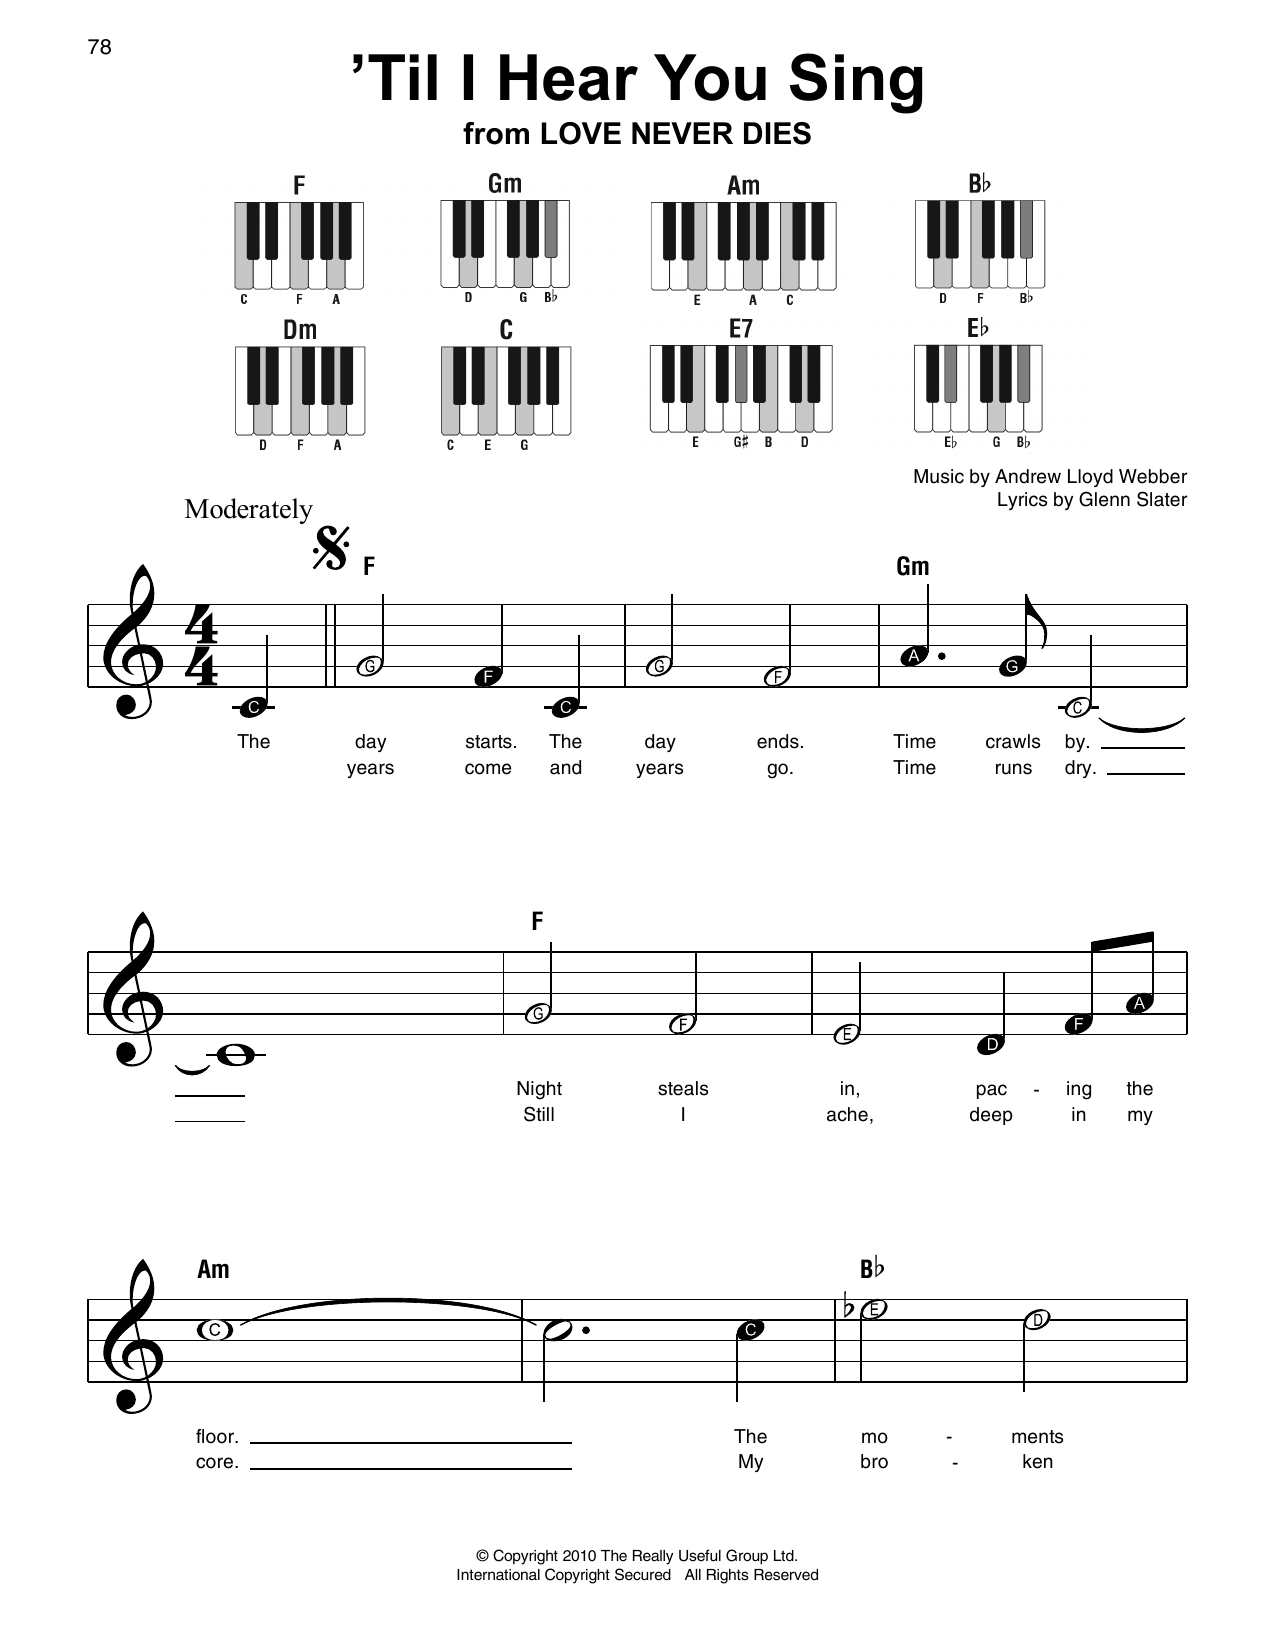 'Til I Hear You Sing (from 'Love Never Dies') Sheet Music